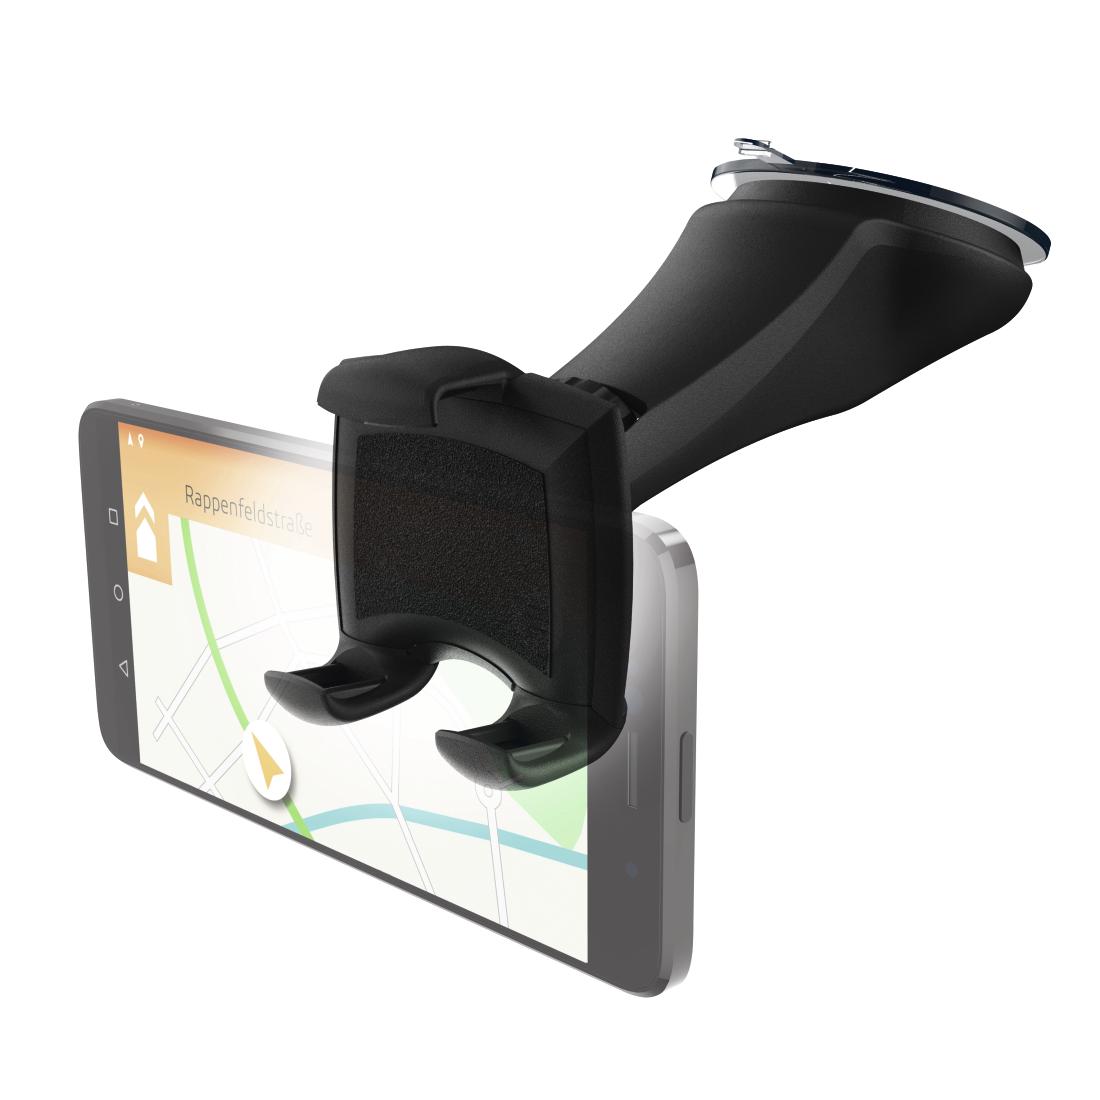 00136408 hama smartphone halter smart grip 2 hama de. Black Bedroom Furniture Sets. Home Design Ideas